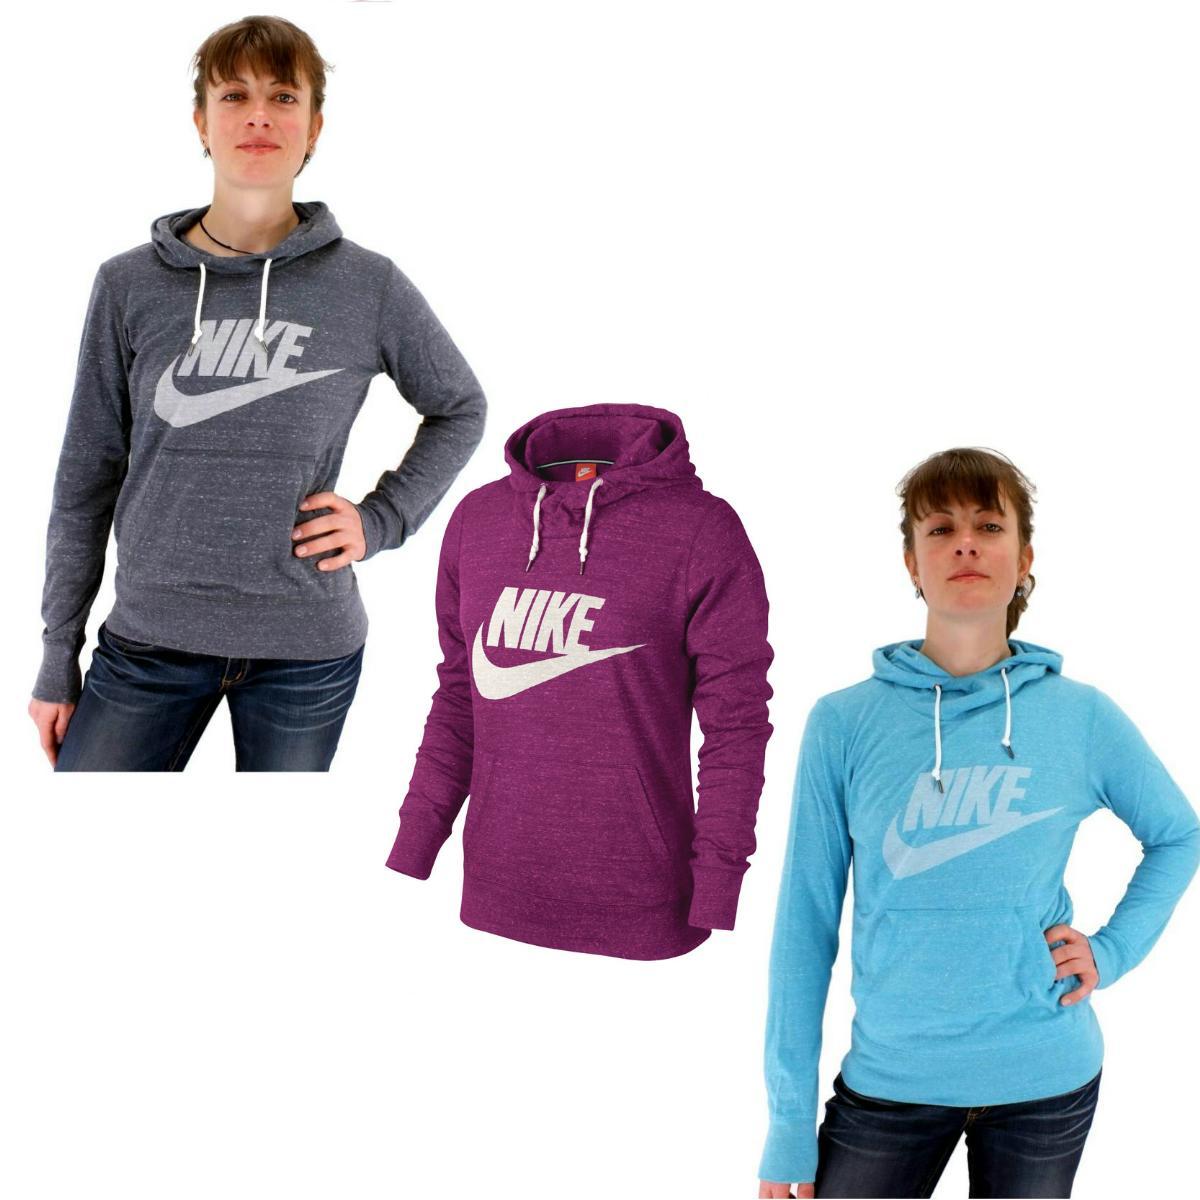 nike gym vintage hoody damen pullover kapuzenpullover sweatshirt grau blau pink ebay. Black Bedroom Furniture Sets. Home Design Ideas